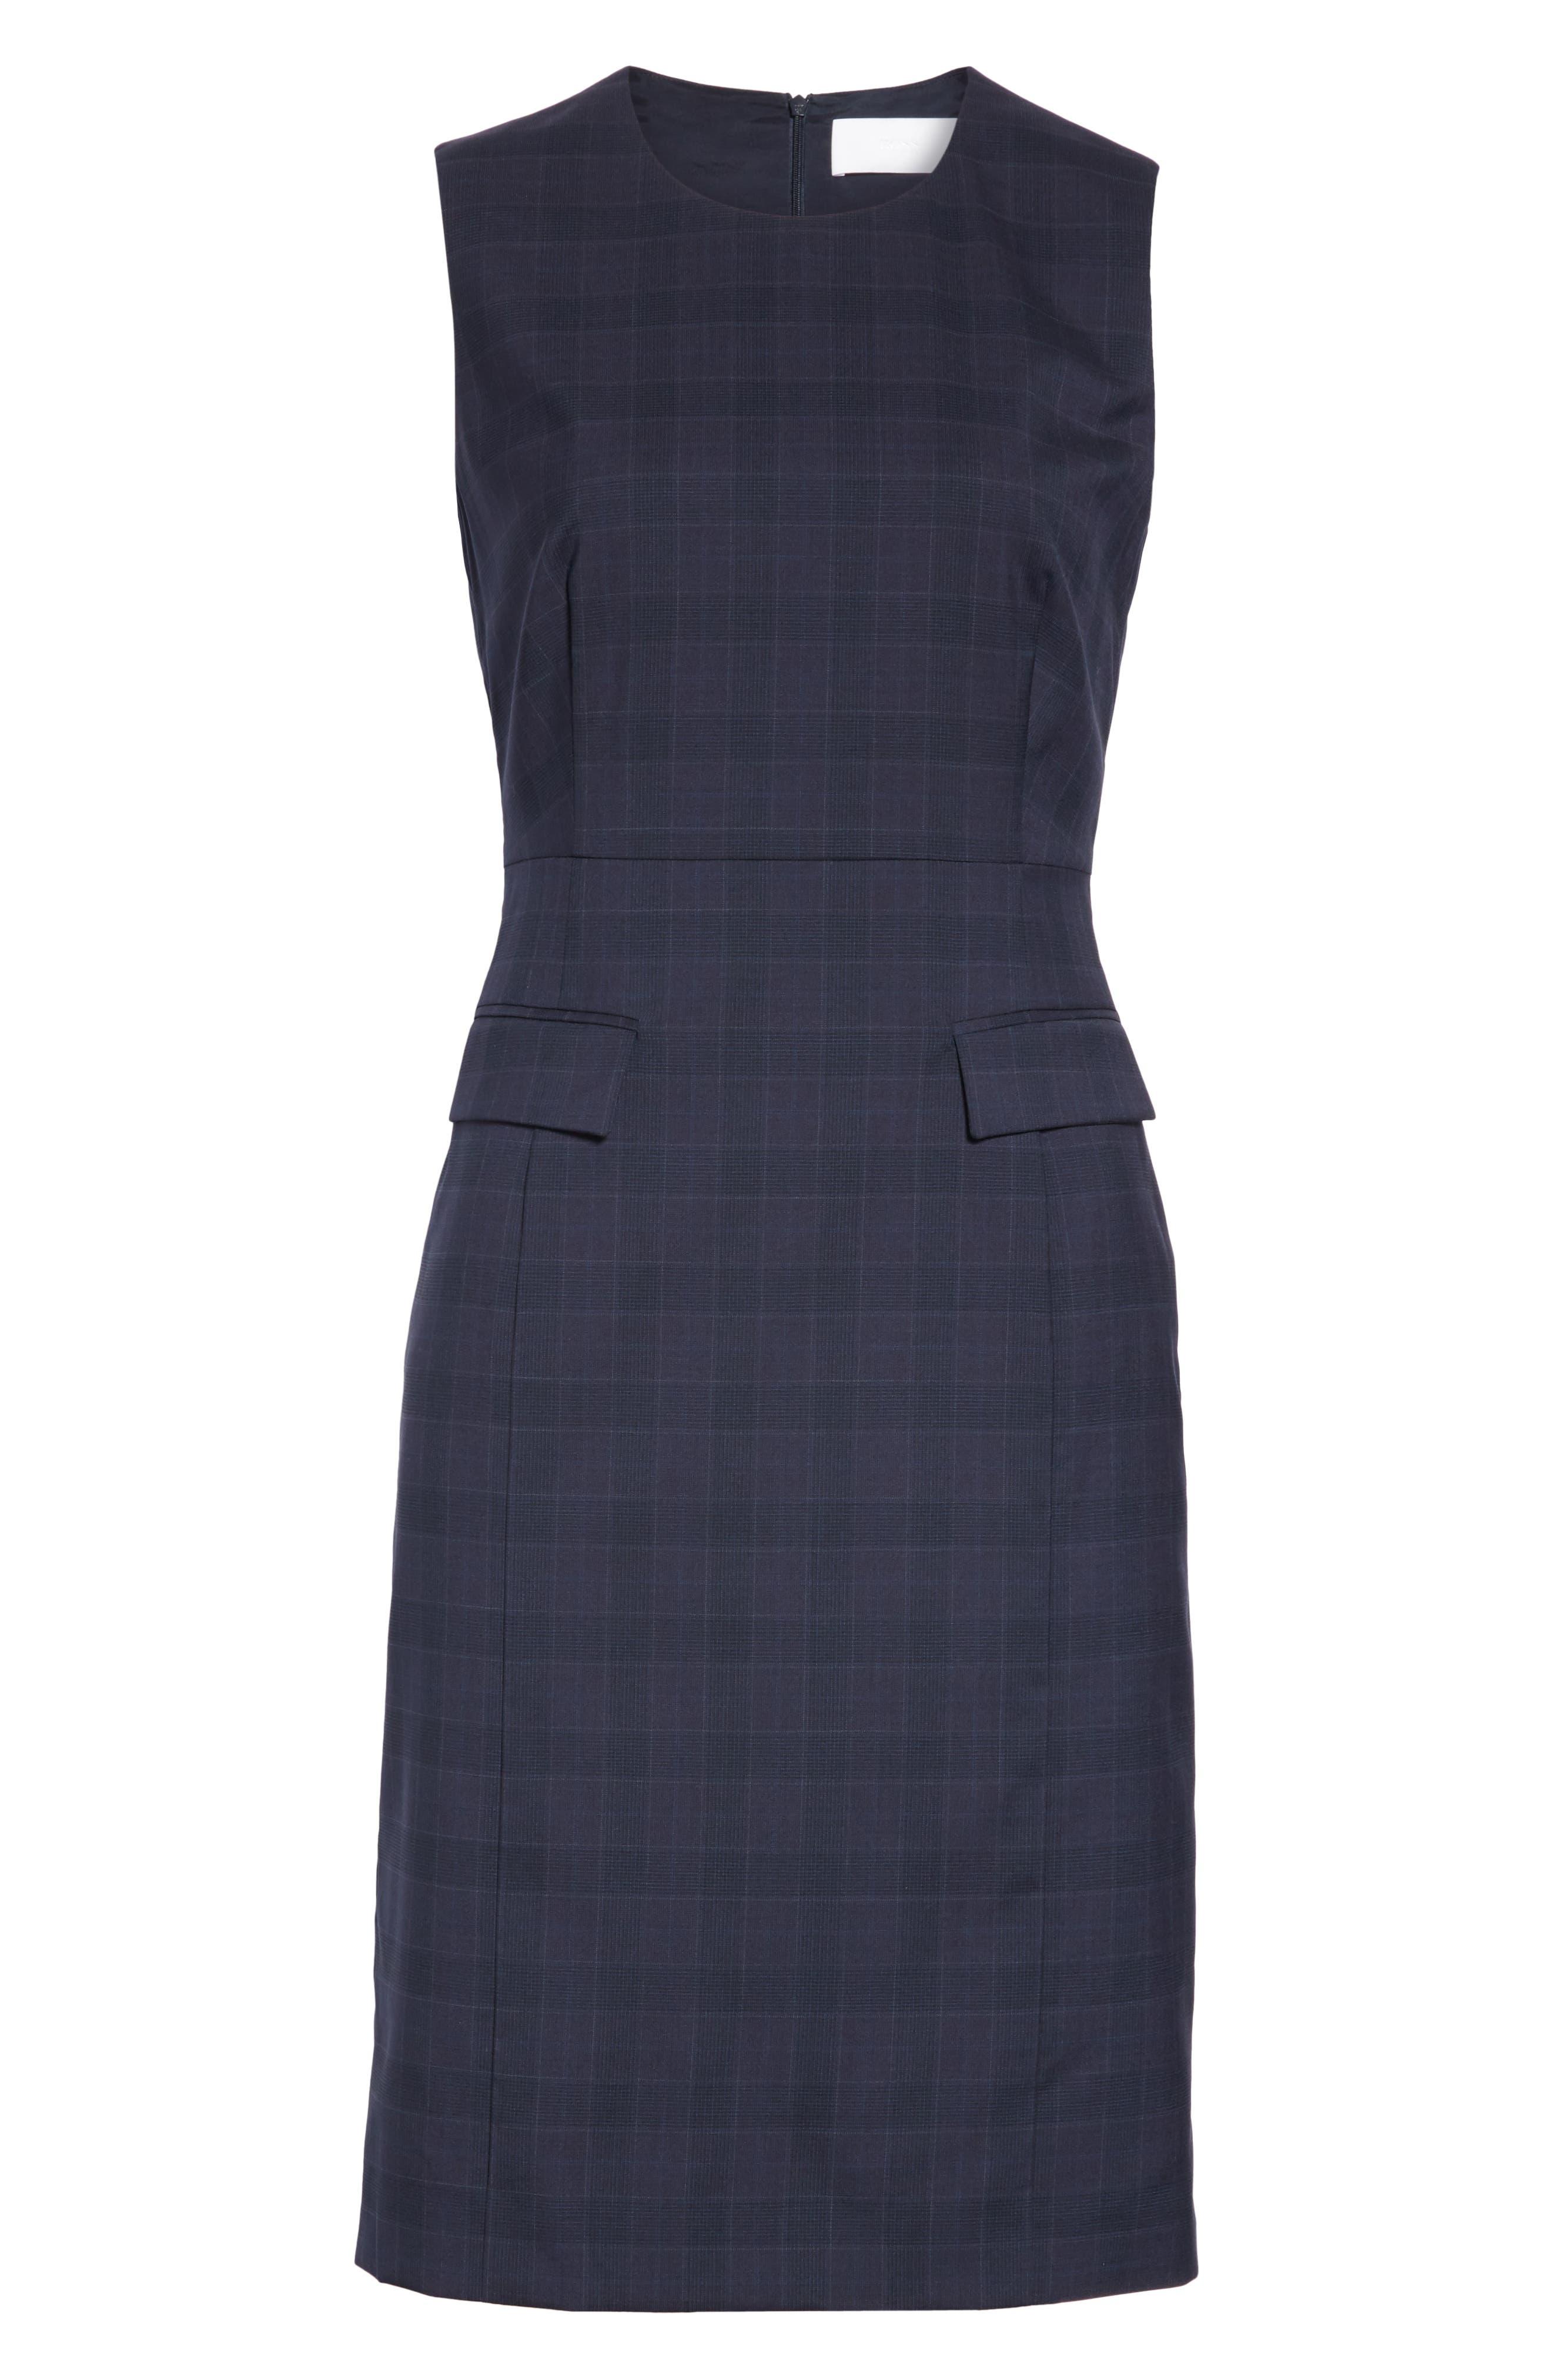 BOSS, Docanes Modern Check Wool Dress, Alternate thumbnail 7, color, DARK NAVY FANTASY